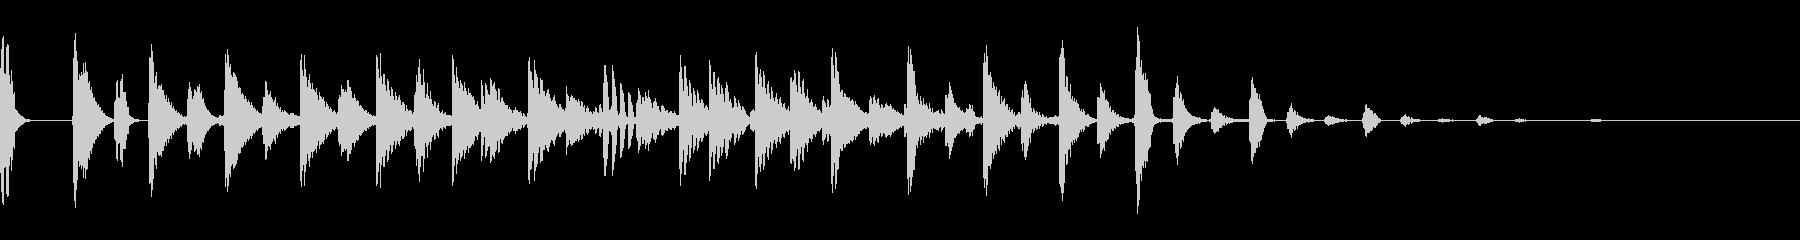 Scene change, touch use SE02-1's unreproduced waveform